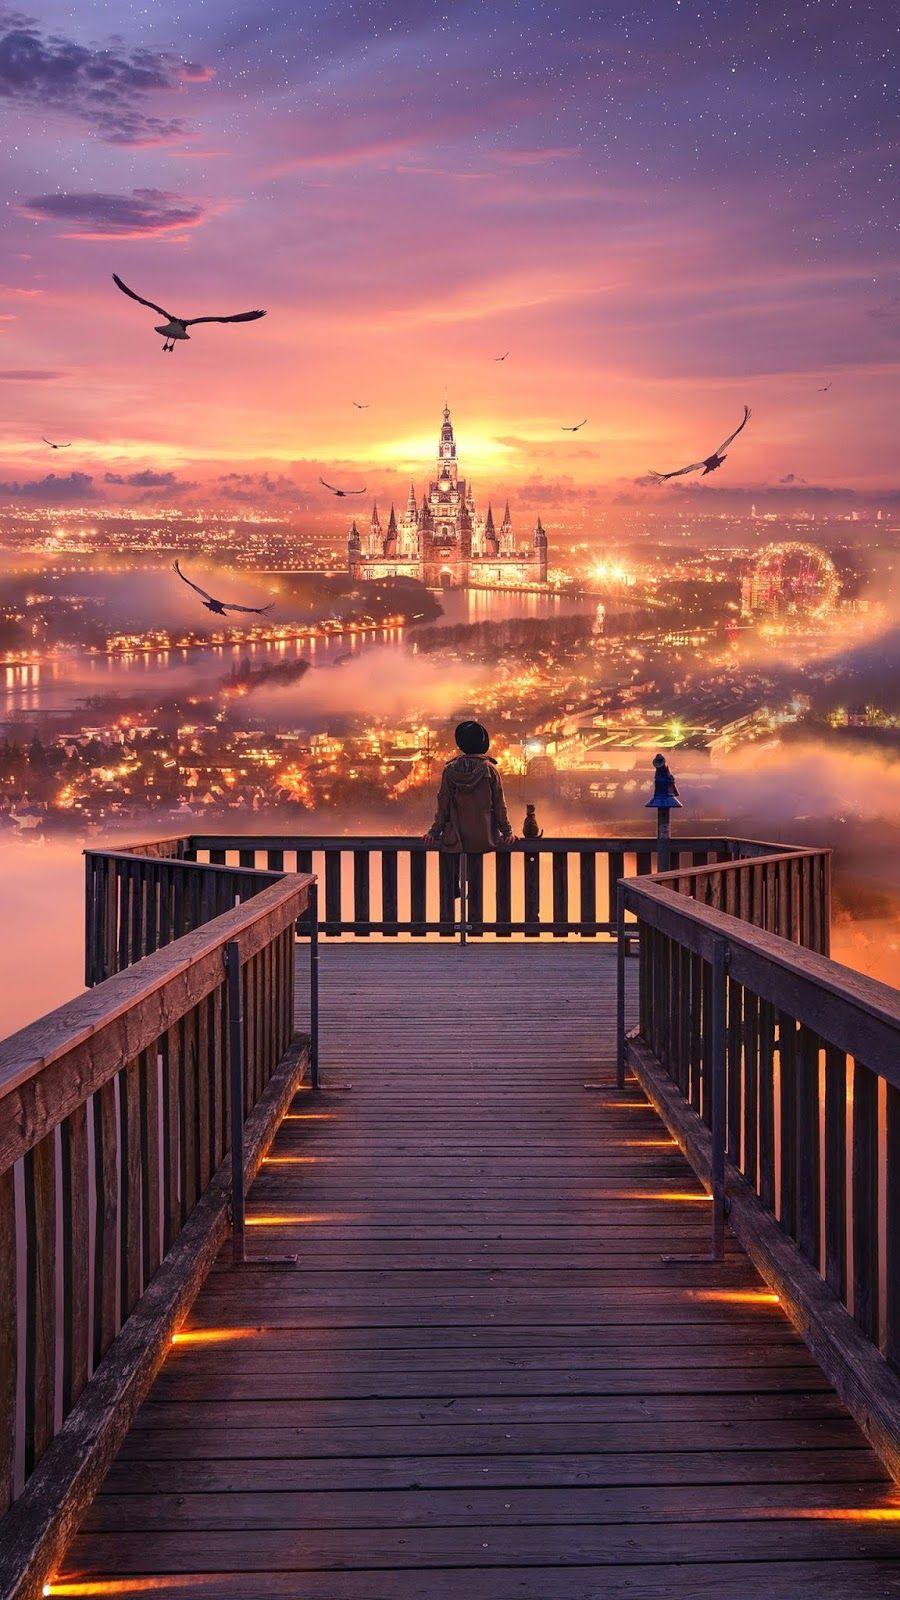 The City Of Dream Anime Scenery Wallpaper Scenery Wallpaper Anime Scenery